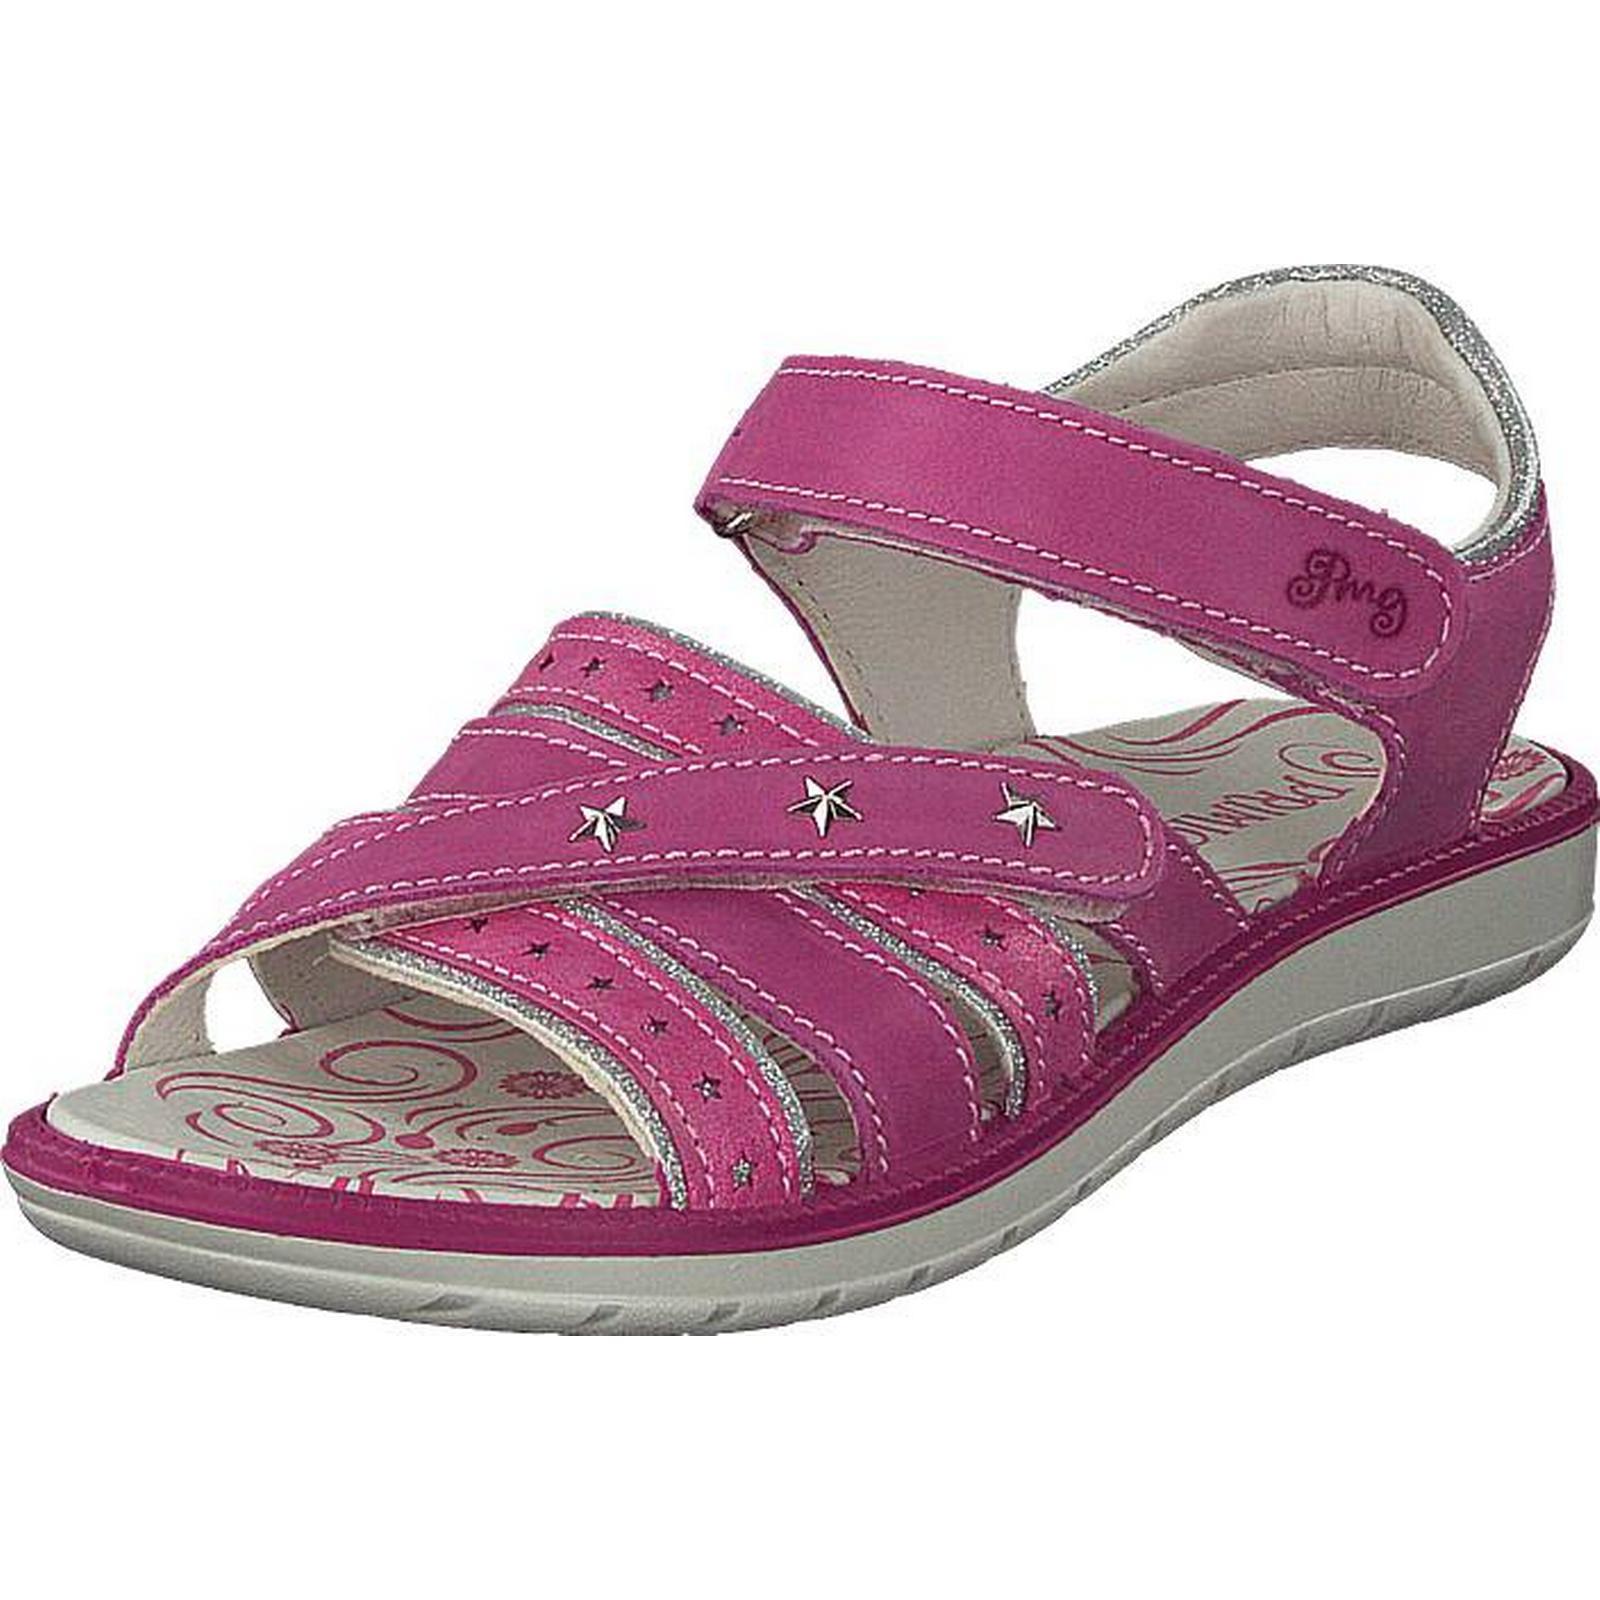 Primigi Pal 13806 Pink, Shoes, Sandals & & Sandals Slippers, Strappy Sandals, Pink, Unisex, 26 1abb18